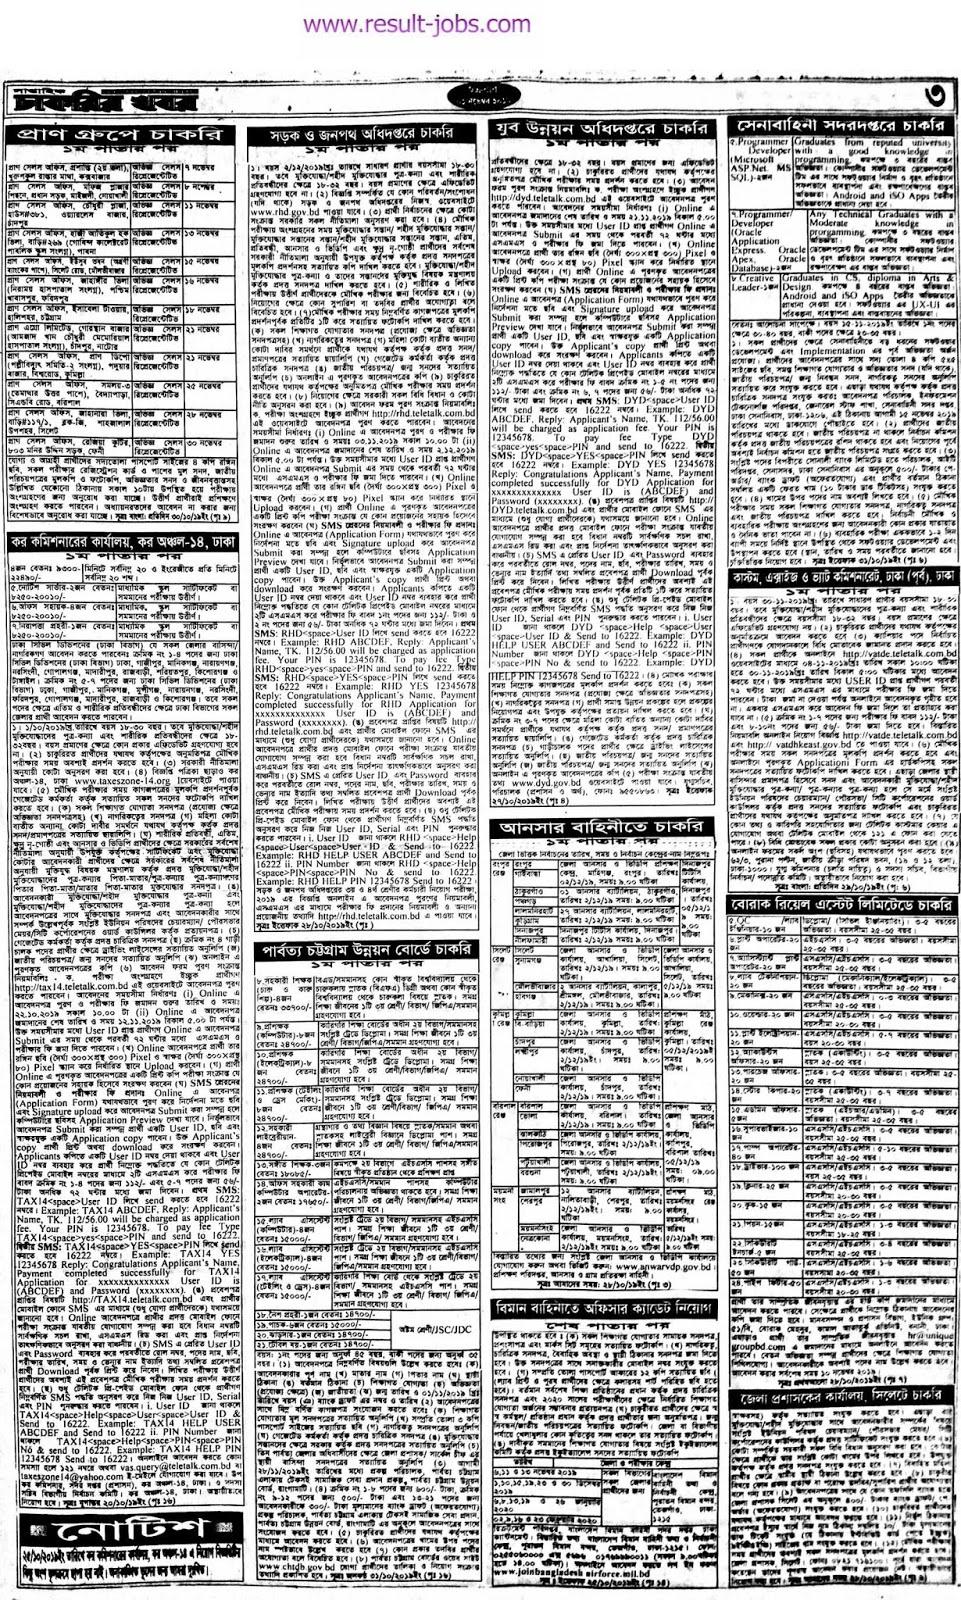 weekly chakrir khobor newspaper 2018,weekly chakrir khobor bangla newspaper,chakrir khobor,weekly job newspaper 9 november 2018,weekly chakrir khobor,weekly job news bangla,weekly job newspaper,weekly job newspaper in bangladesh,bangla newspaper,weekly job newspaper pdf,weekly chakrir khobor potrika,weekly job newspaper 20th october 2107 chakrir khobor,bangla news,all bangladeshi newspaper jobs